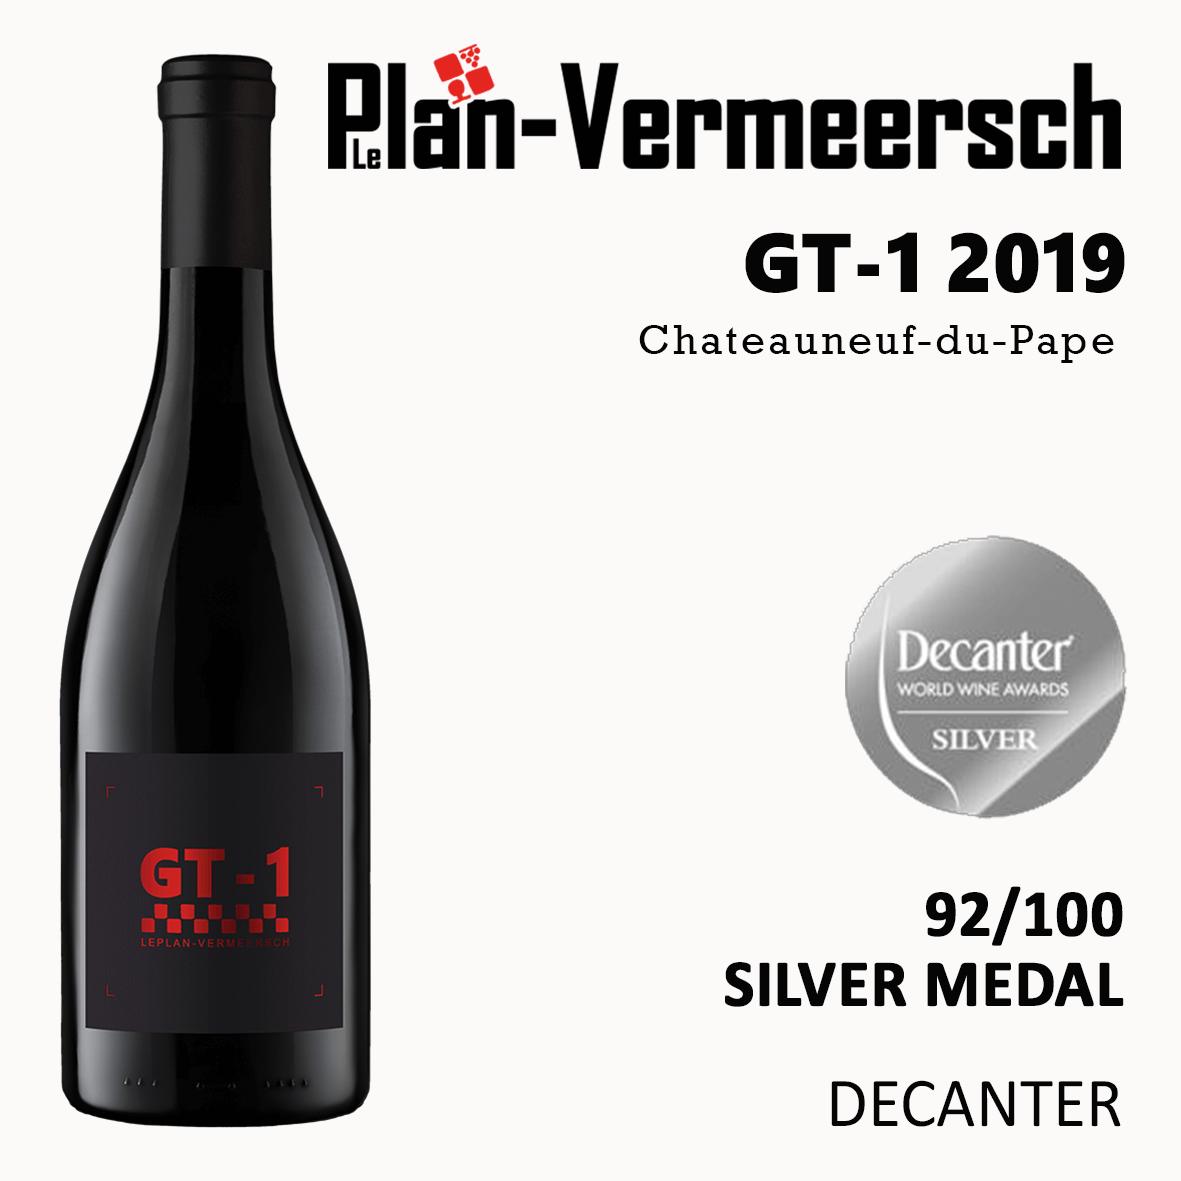 Bottle of wine chateauneuf du pape silver medal decanter Leplan-Vermeersch